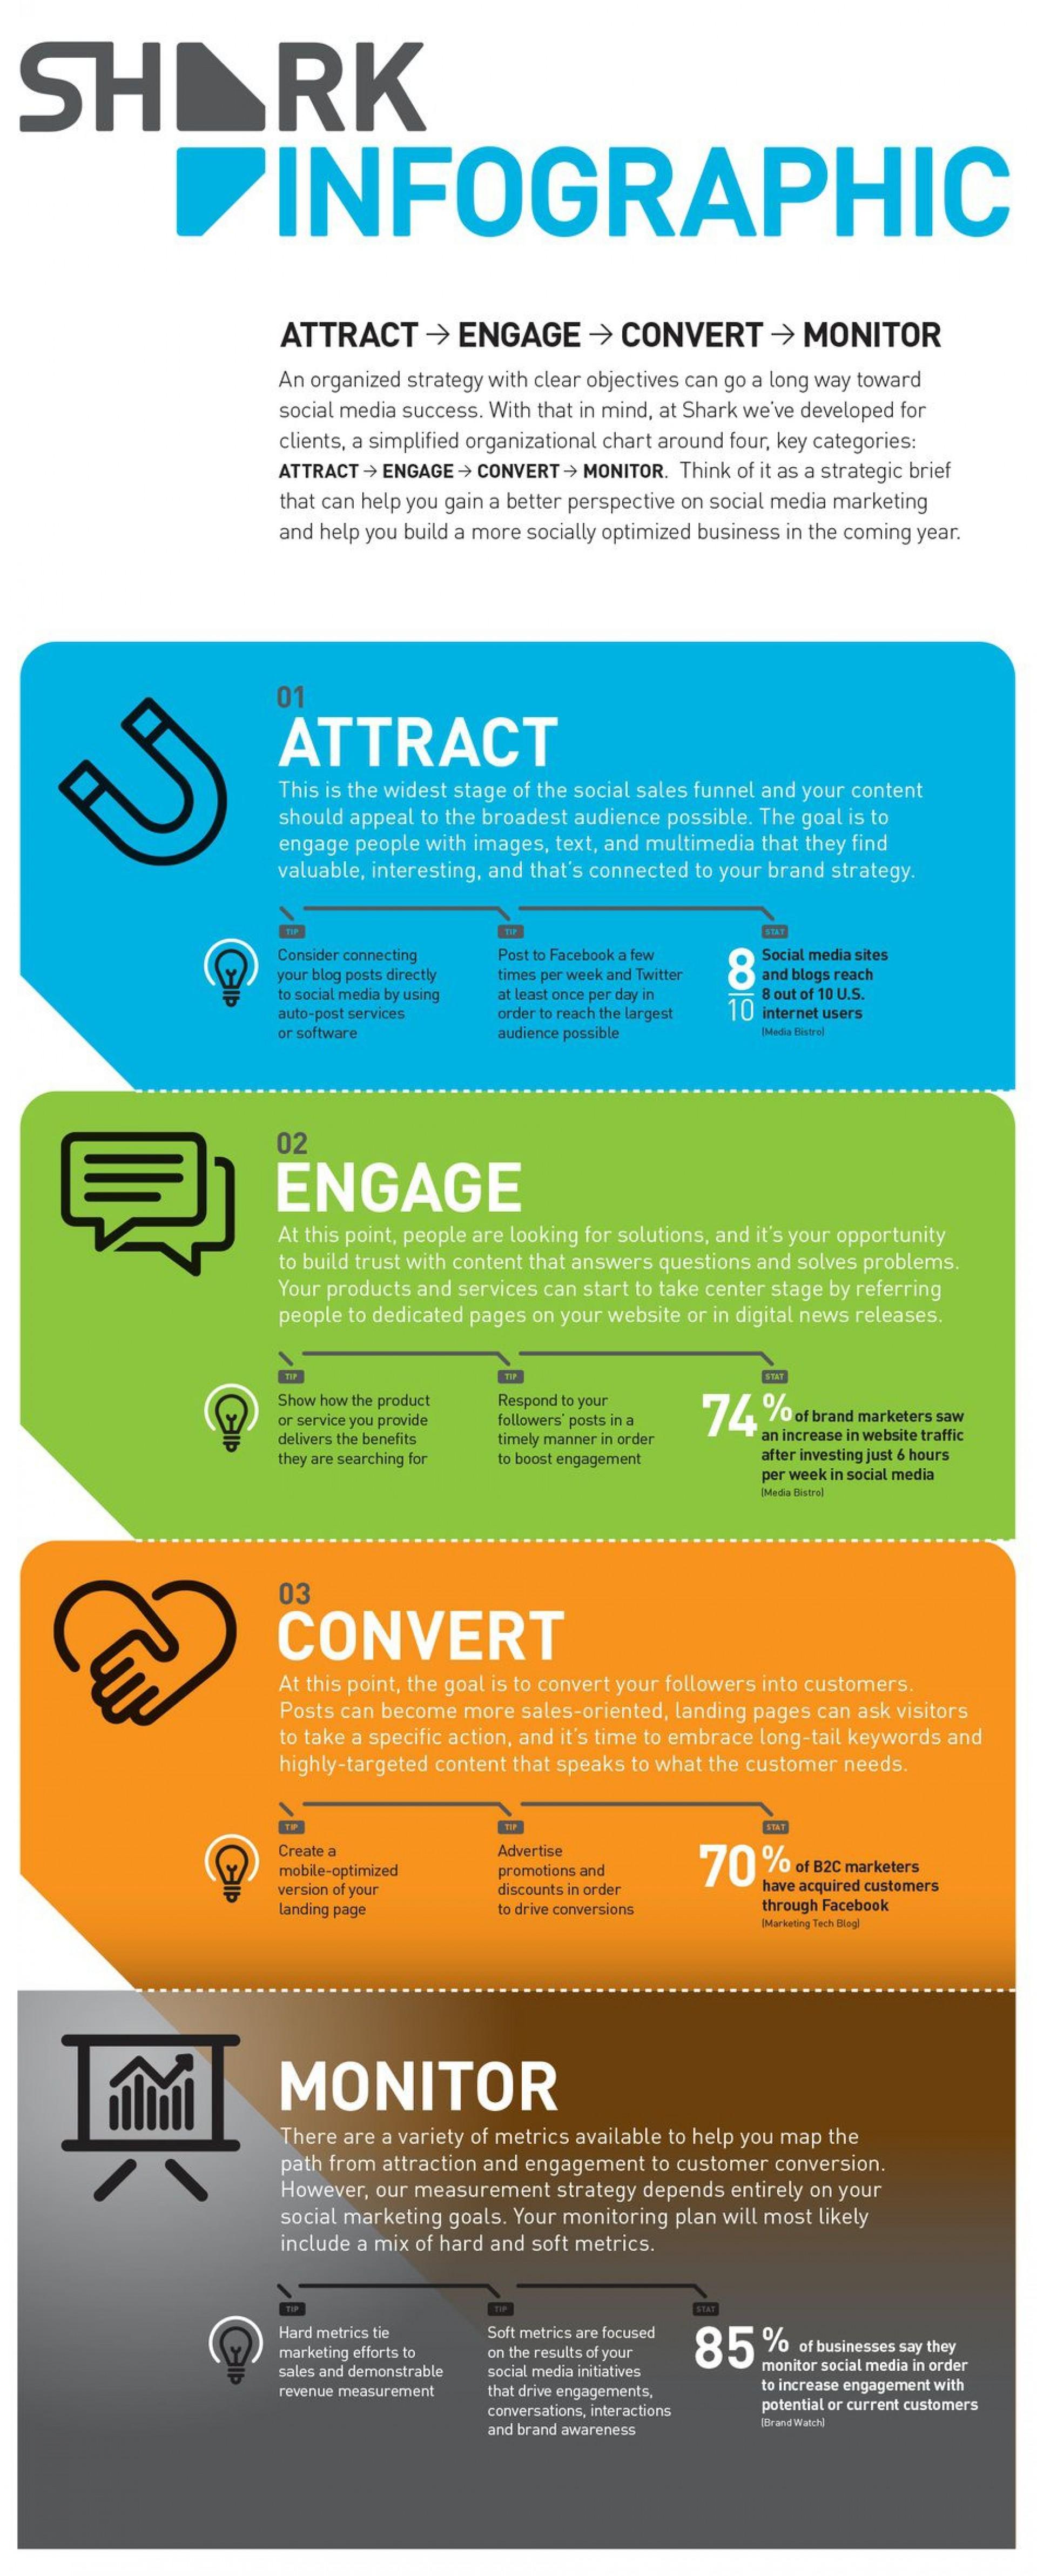 008 Imposing Social Media Marketing Plan Template 2018 Image 1920